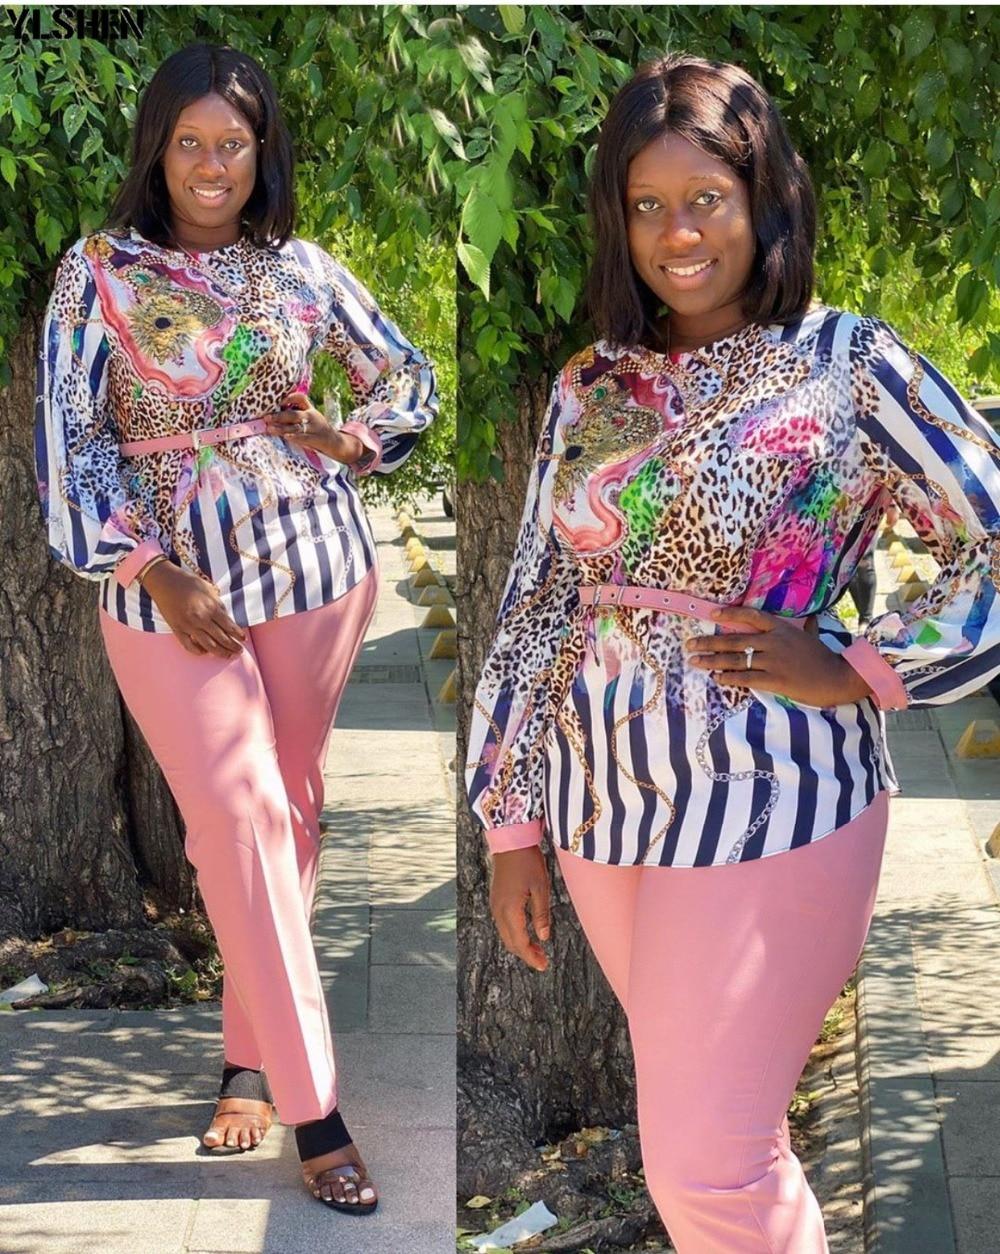 Two 2 Piece Set African Clothes Africa 2020 Dashiki Fashion Print Dresses Suit Bazin Top Pants Elastic Party Plus Size Clothing 10